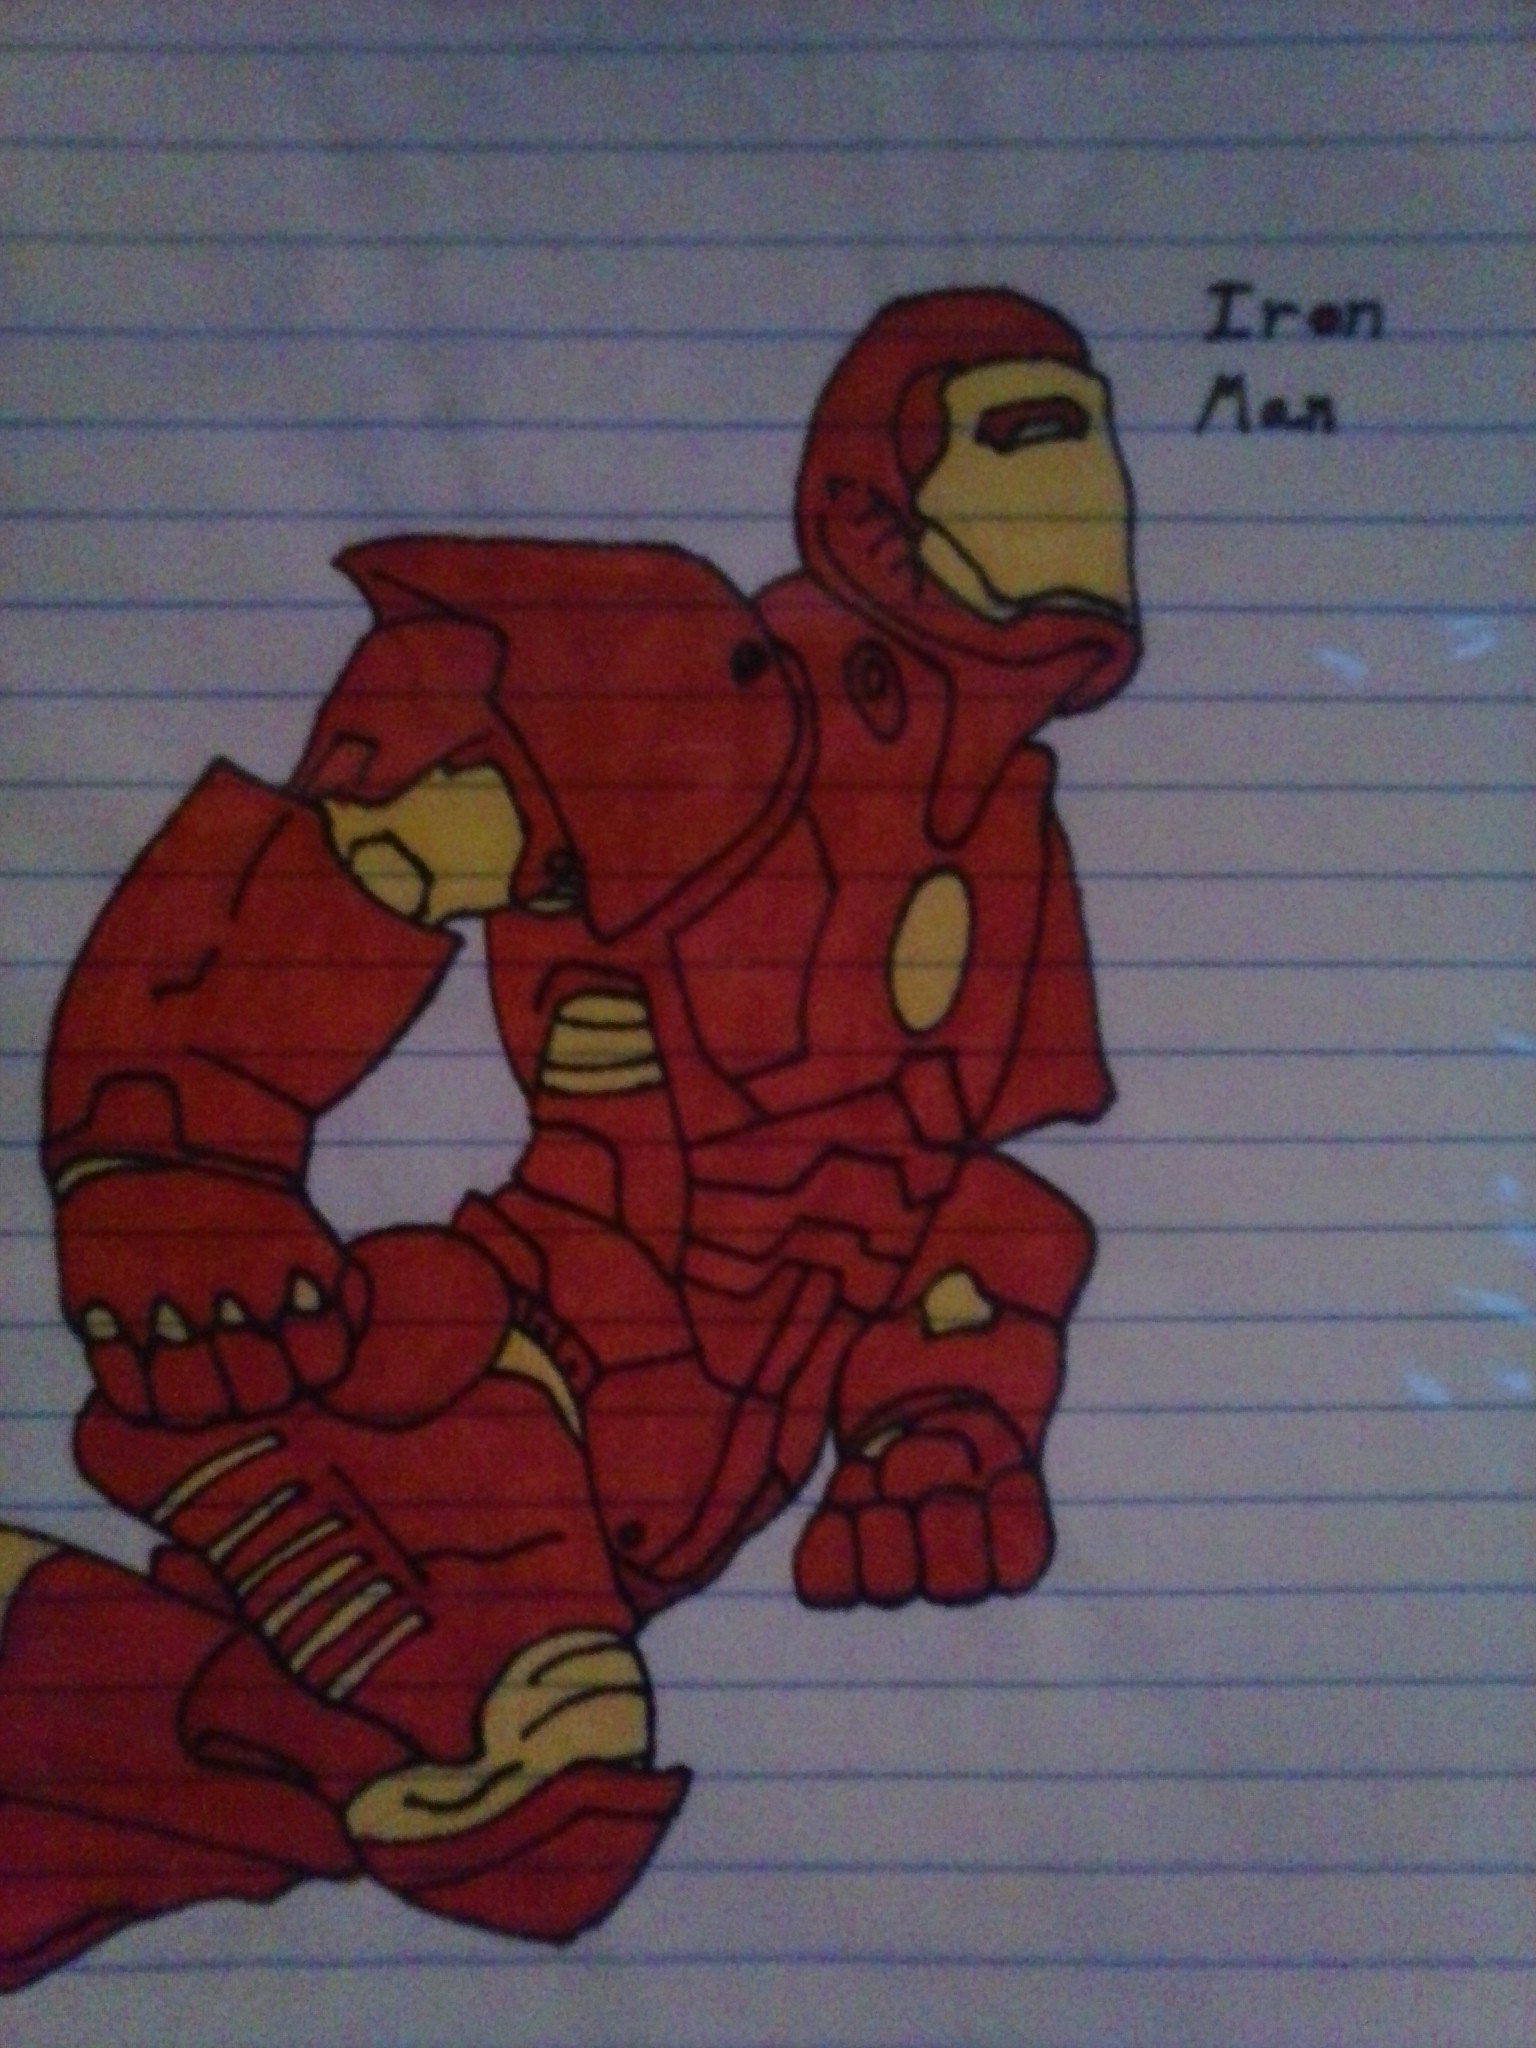 Iron man flying by SaiyanLink